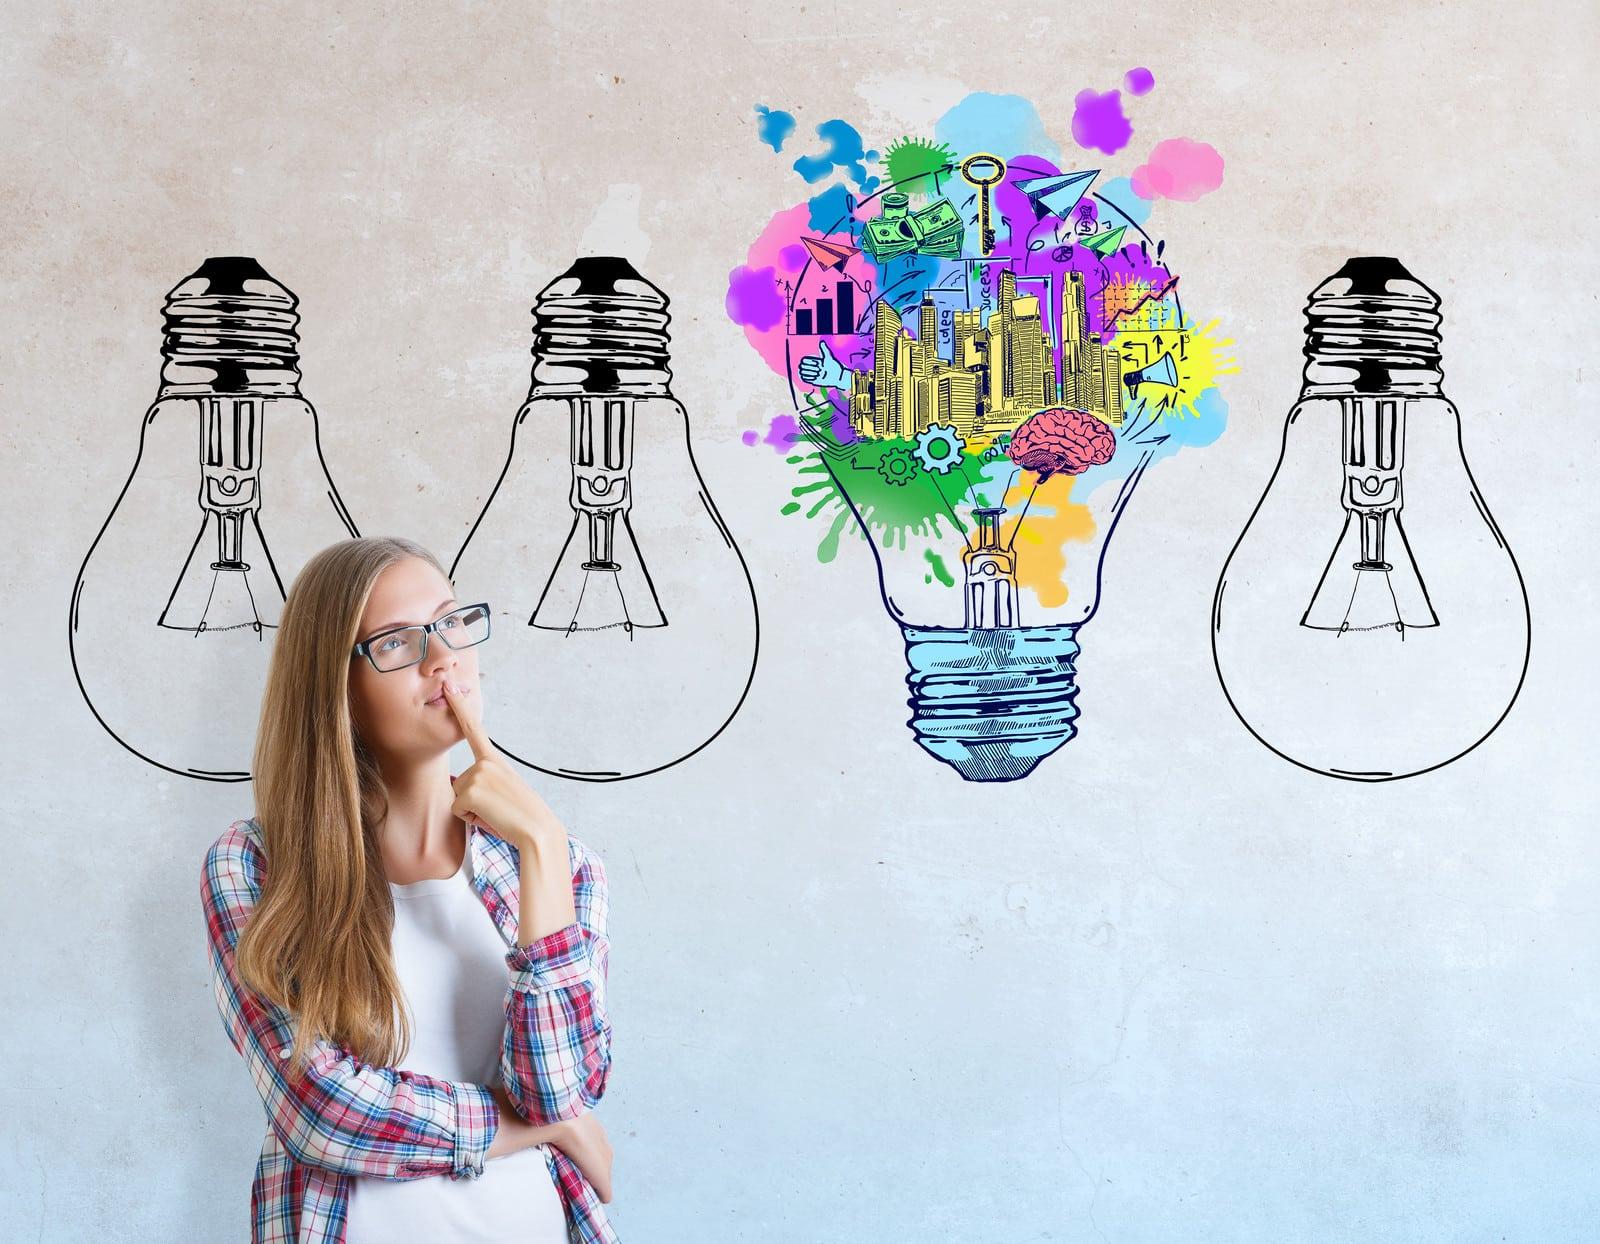 Kata-Kata Bijak Tentang Kreativitas